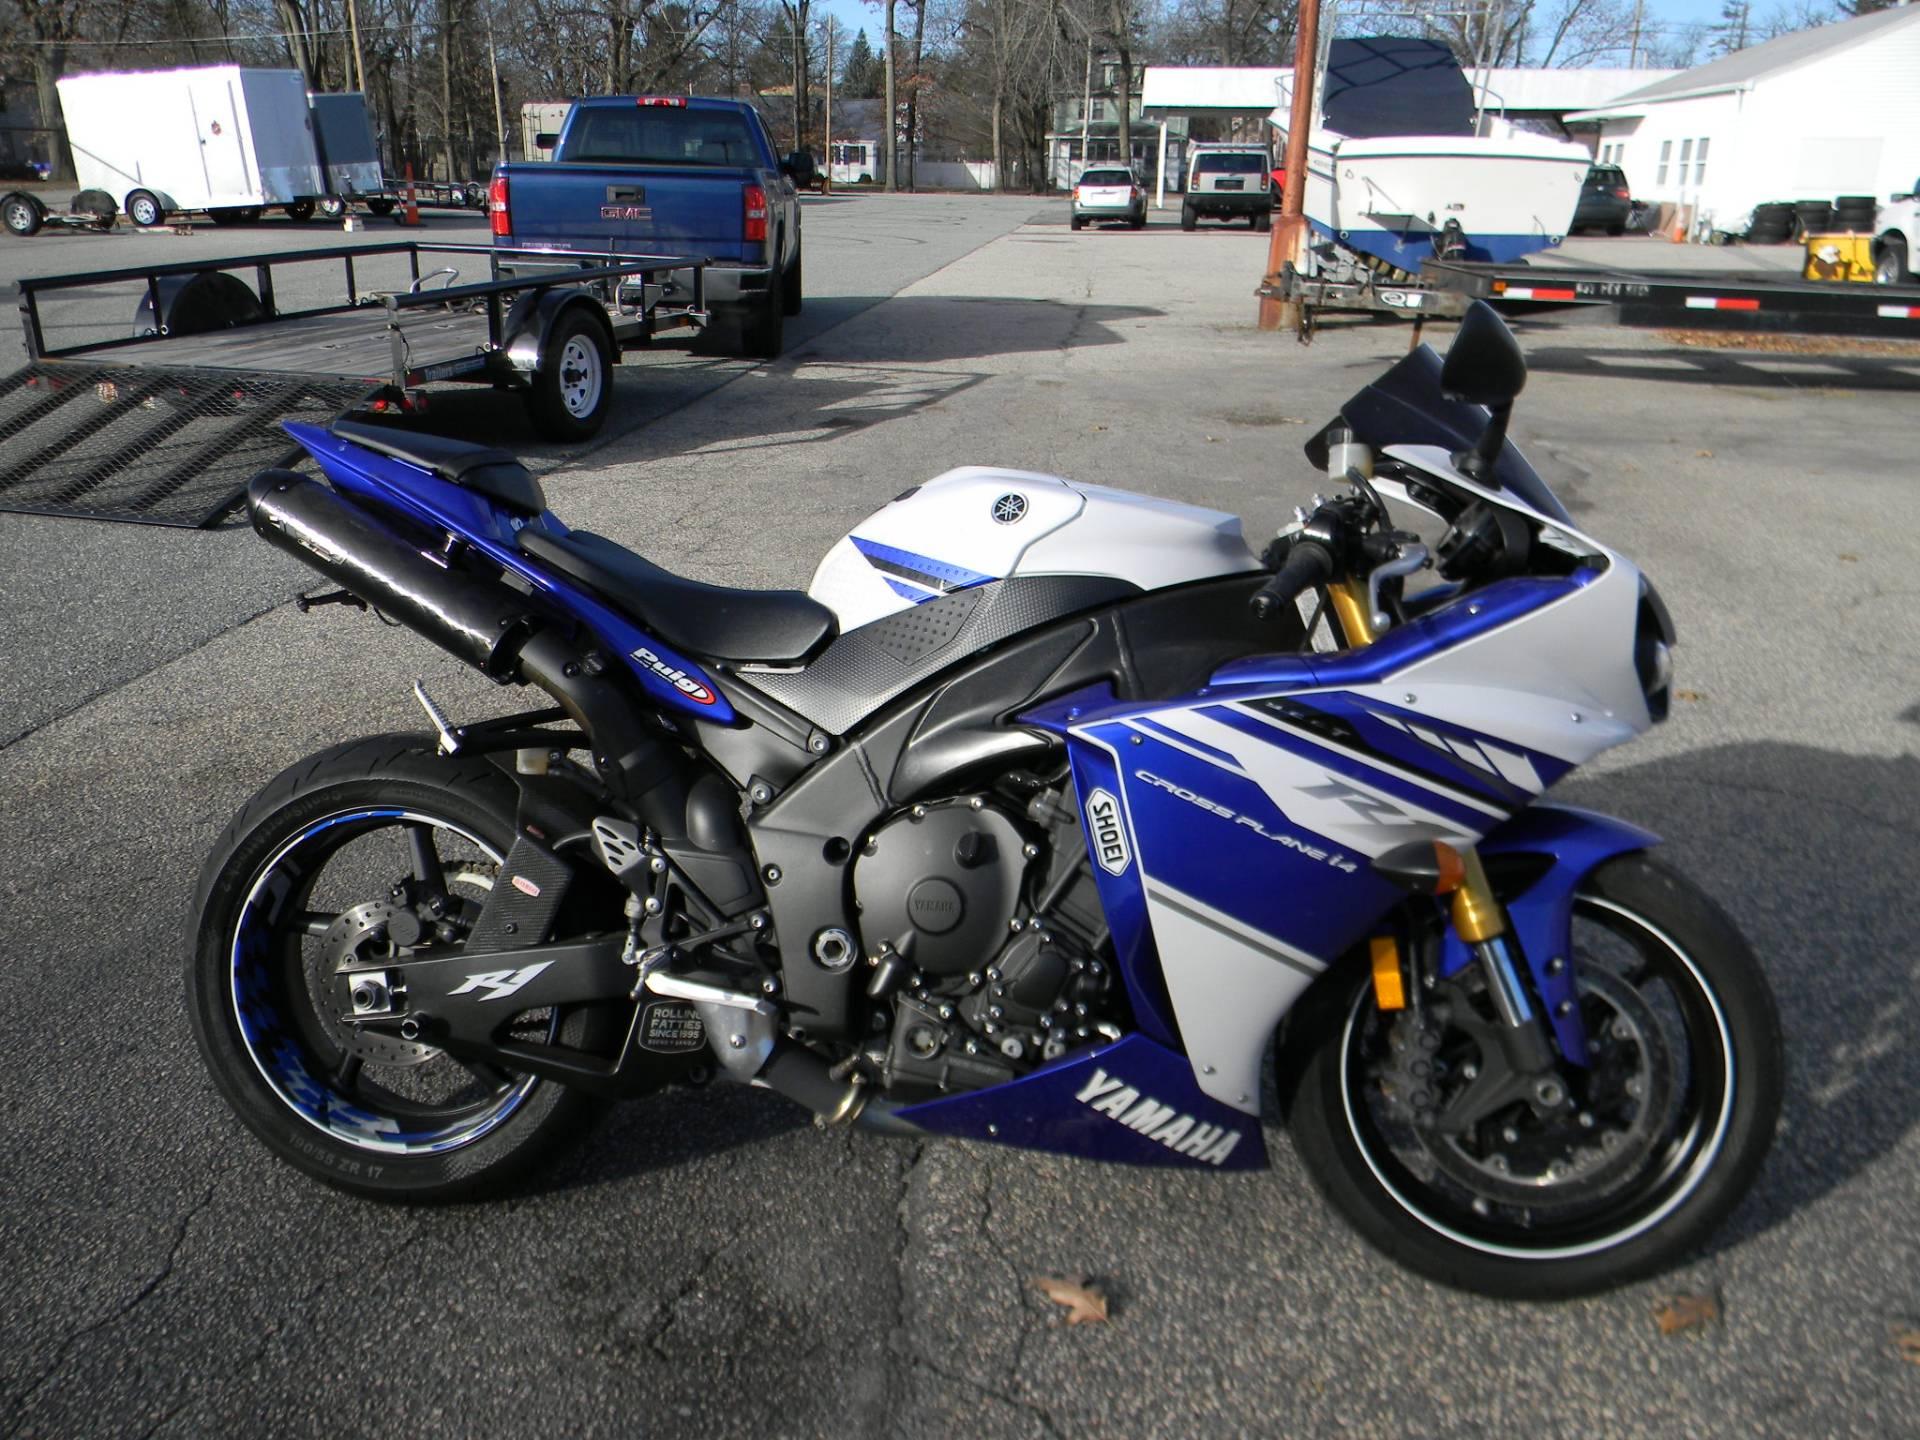 2014 Yamaha YZF-R1 for sale 15928